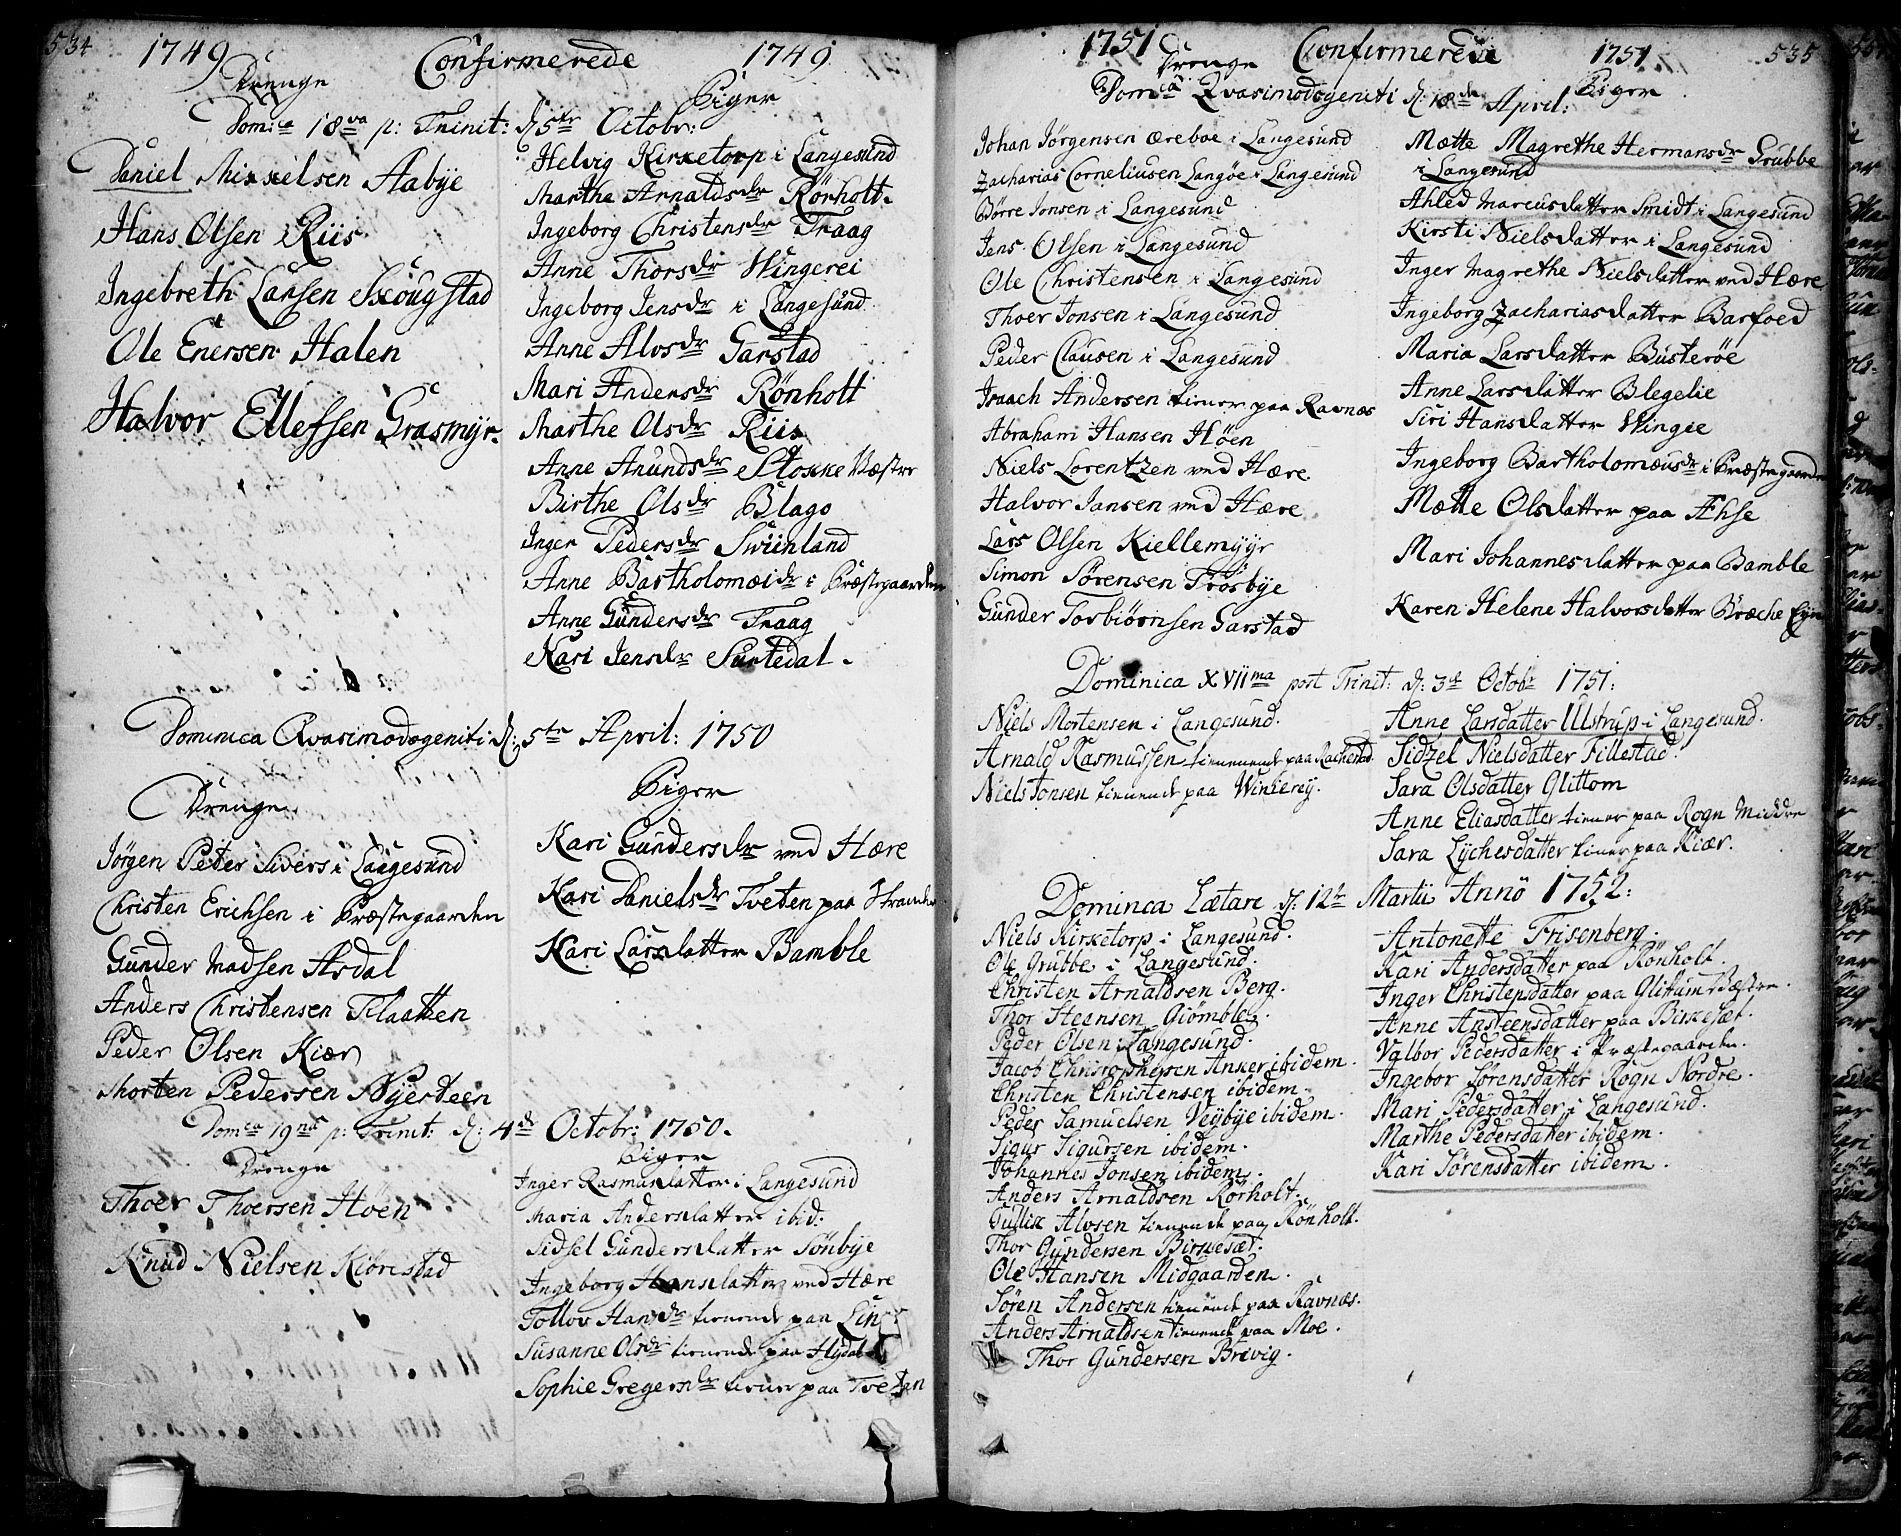 SAKO, Bamble kirkebøker, F/Fa/L0001: Ministerialbok nr. I 1, 1702-1774, s. 534-535